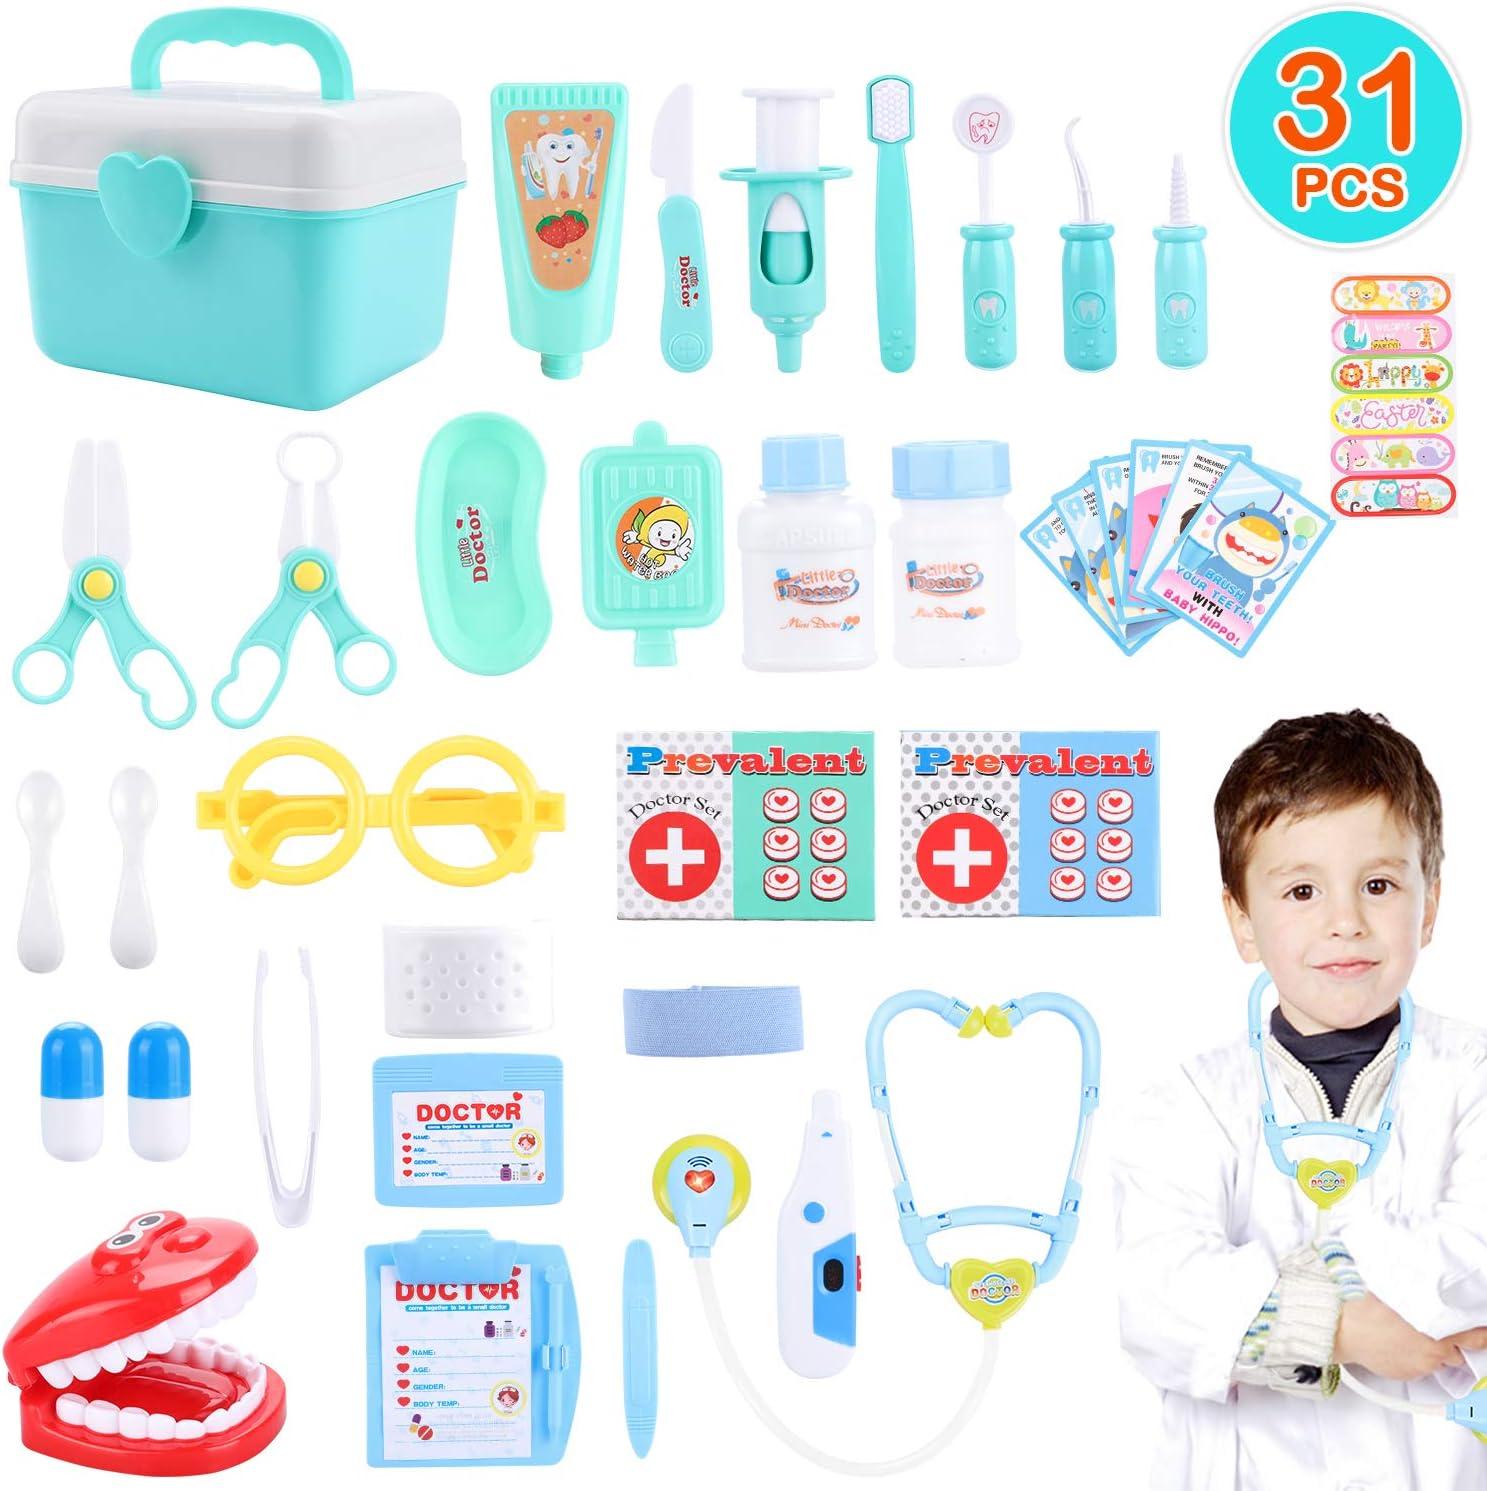 Maletín Doctor, joylink 31Pcs Doctora Juguetes Cuadro Médico Conjunto Enfermera Médico Kit Juego de Rol Cuadro Médico Maletín de Médico Juegos de médicos para Niñas Niños